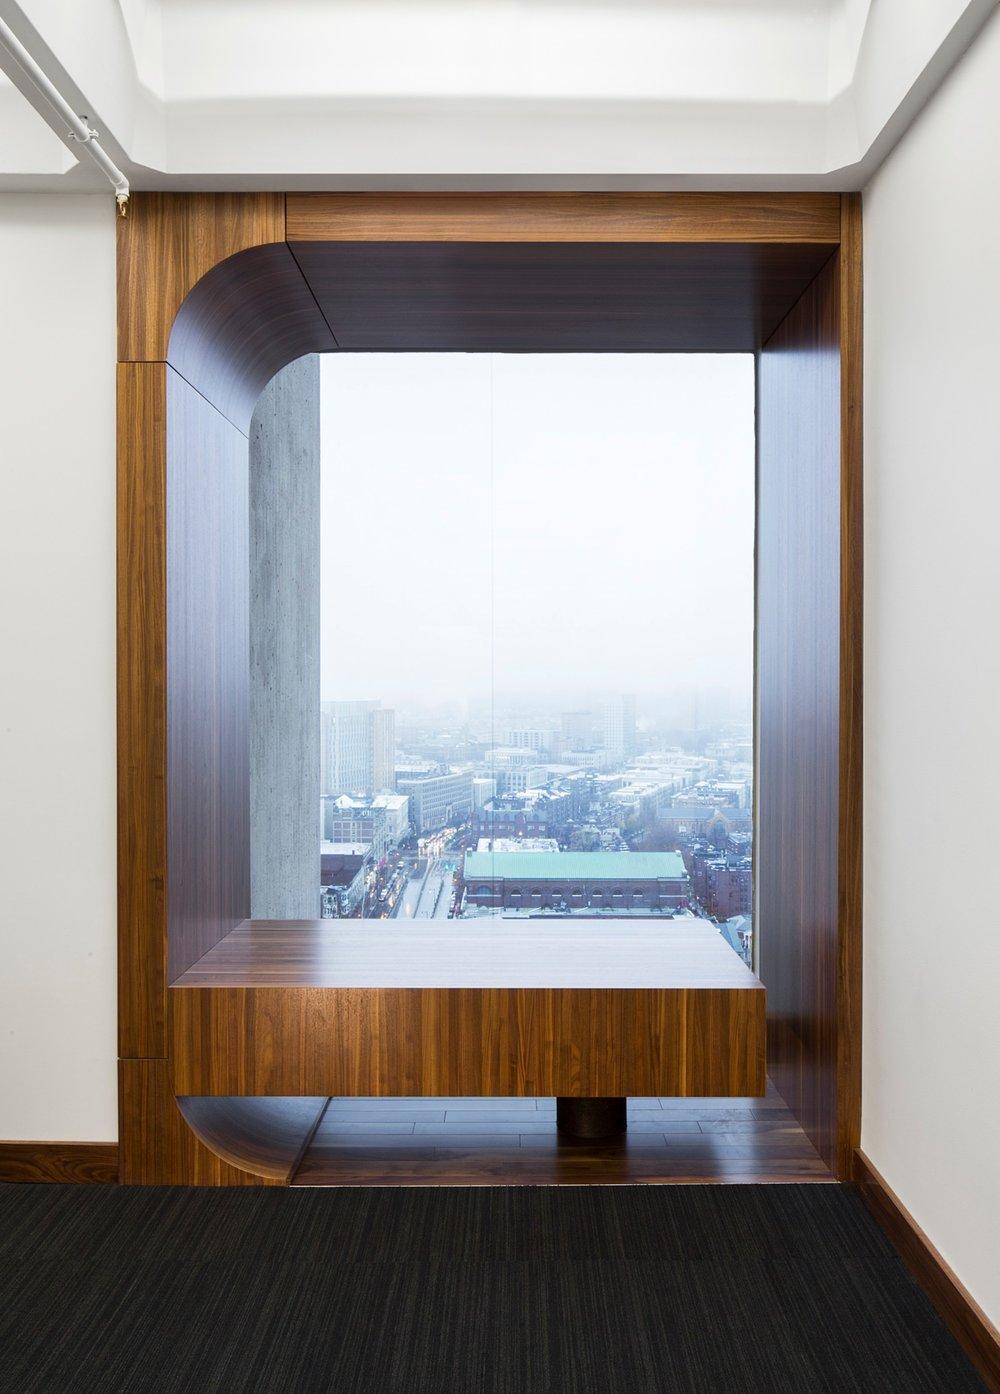 Kensington_Capital_Ventures_Holdings_Corderman_Construction_Office_Finance_Boston_Window.jpg